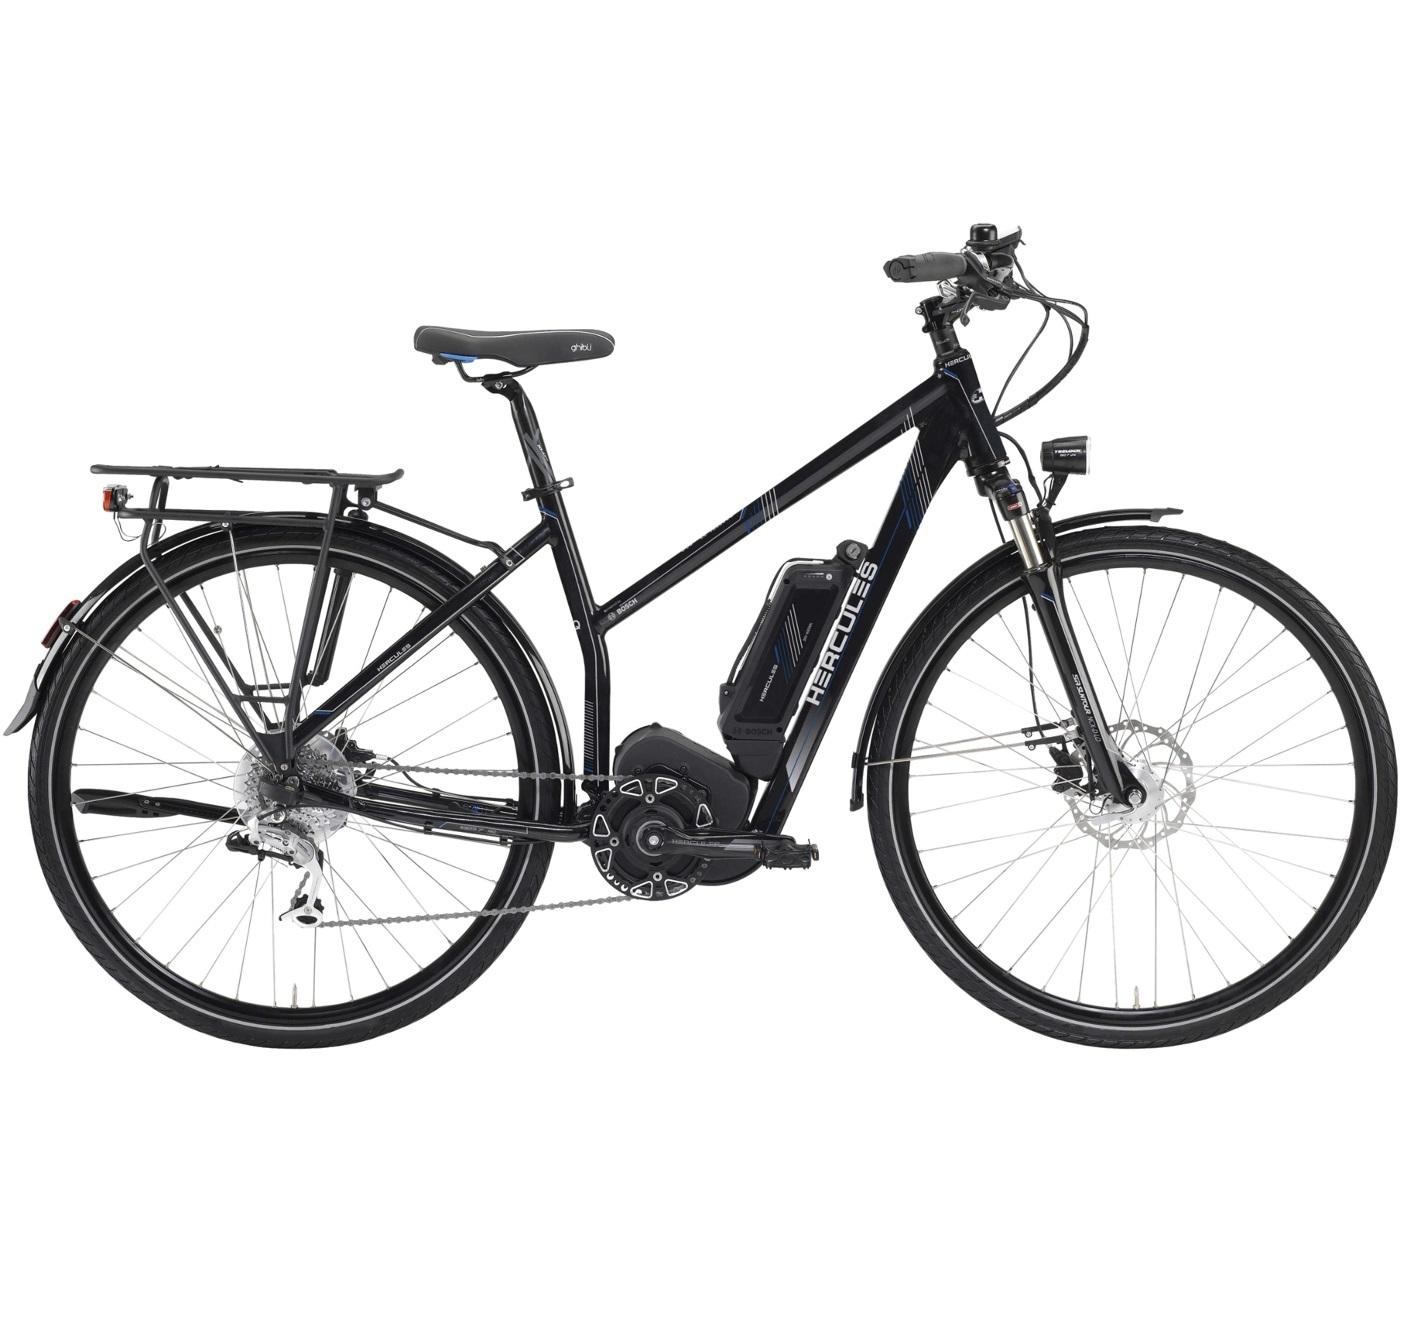 damen elektro fahrrad hercules roberta 27 pro e bike bosch. Black Bedroom Furniture Sets. Home Design Ideas